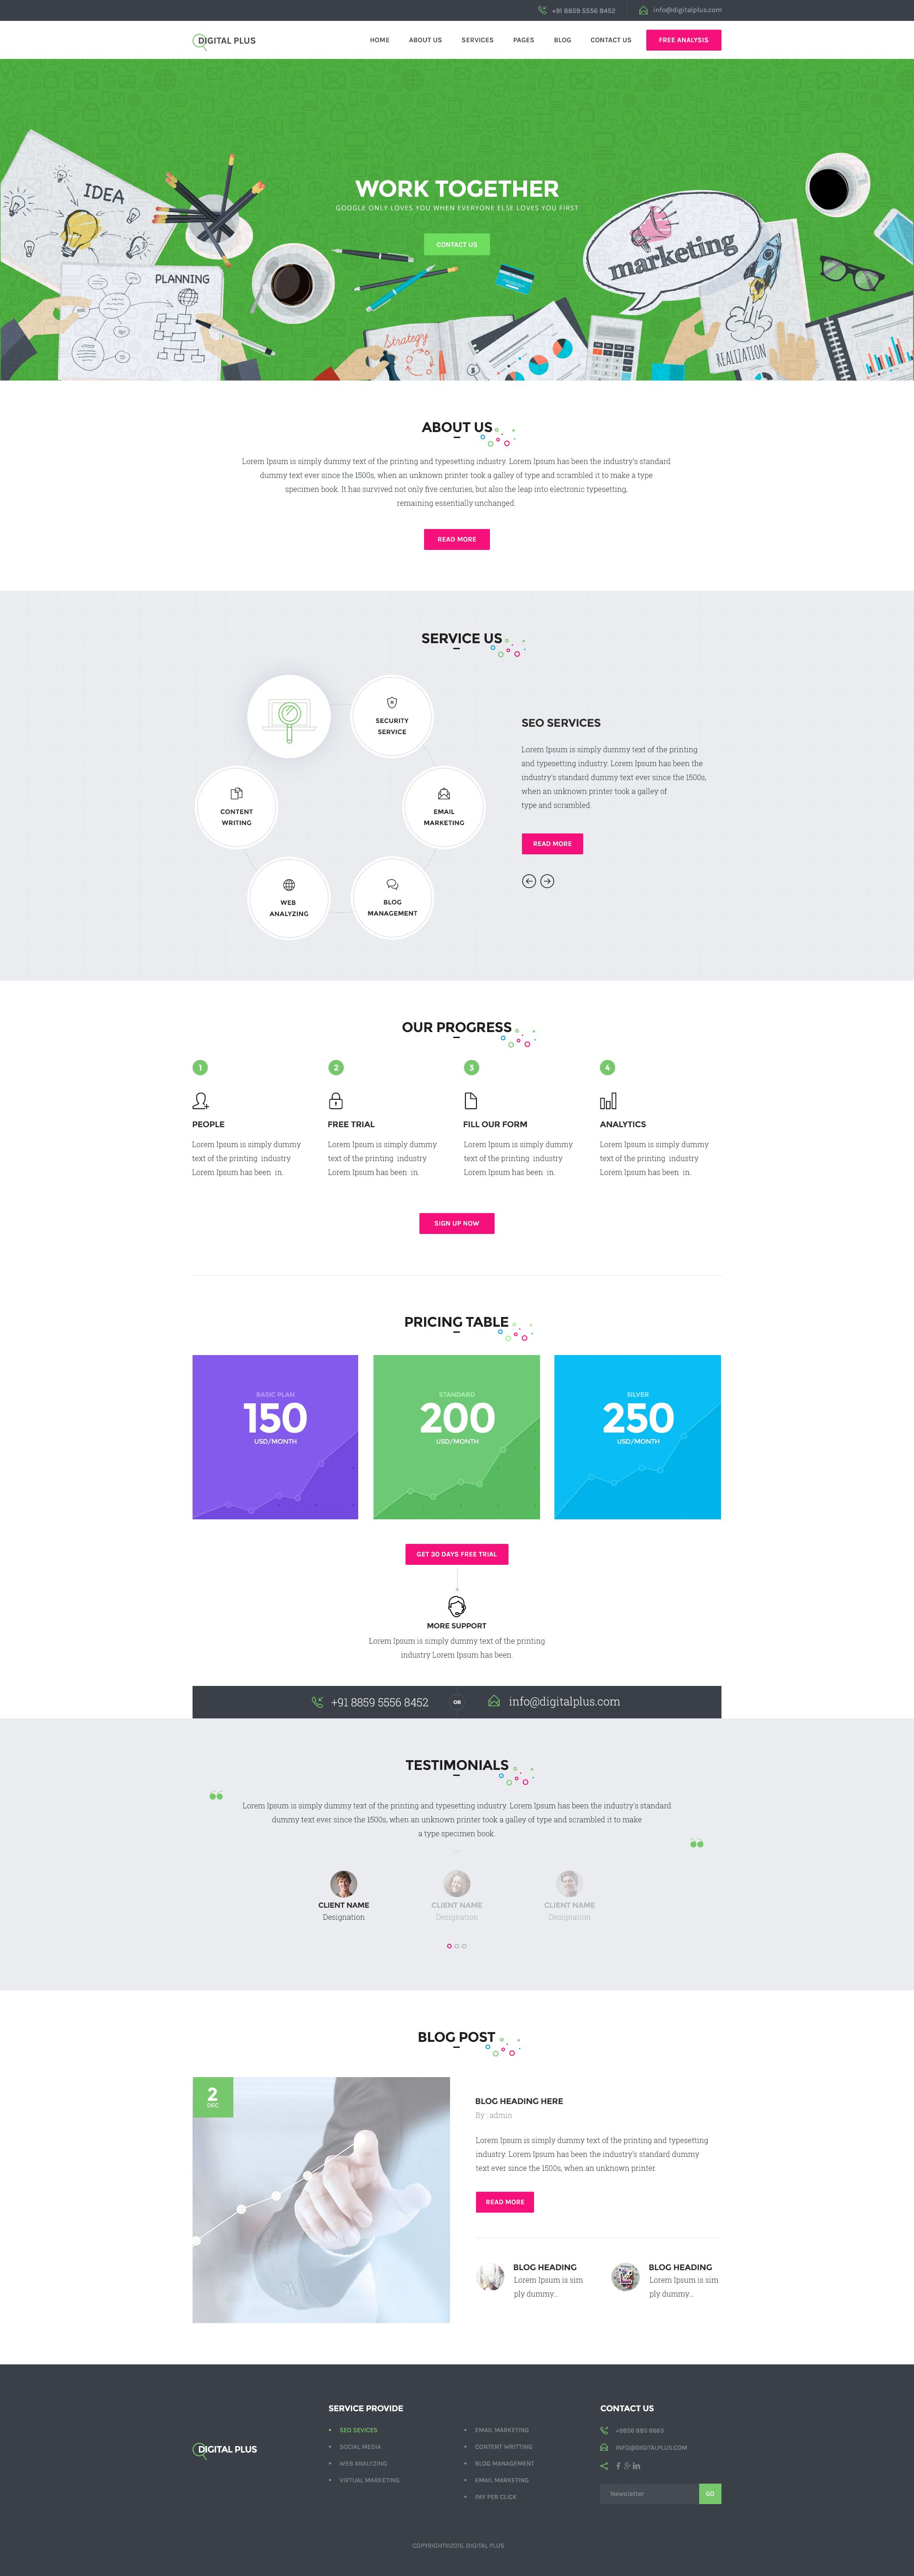 Digital Plus - SEO/Marketing HTML5 Template #SEO, #Digital